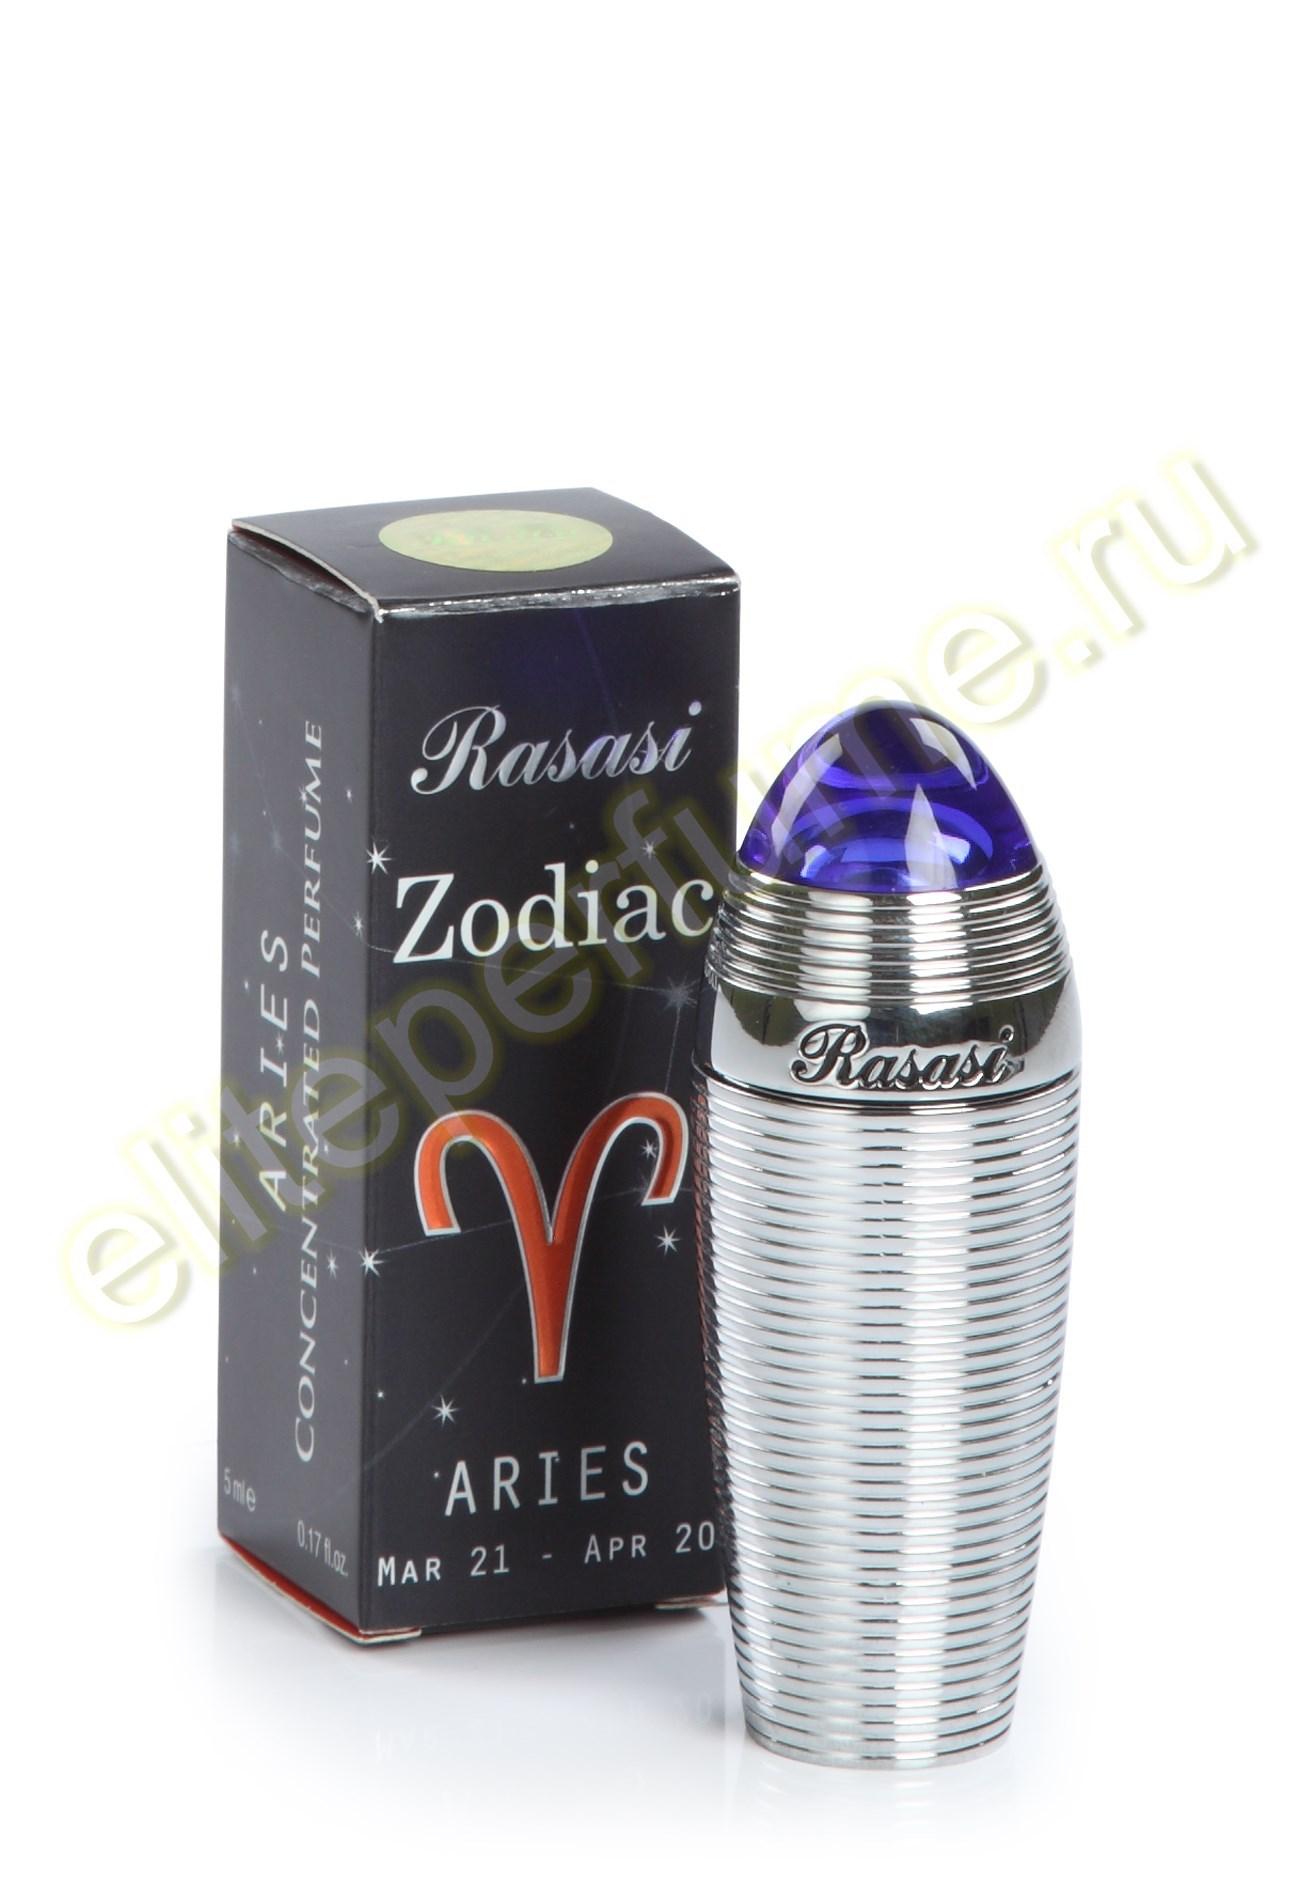 Зодиак Овен Zodiac Aries 5 мл арабские масляные духи от Расаси Rasasi Perfumes